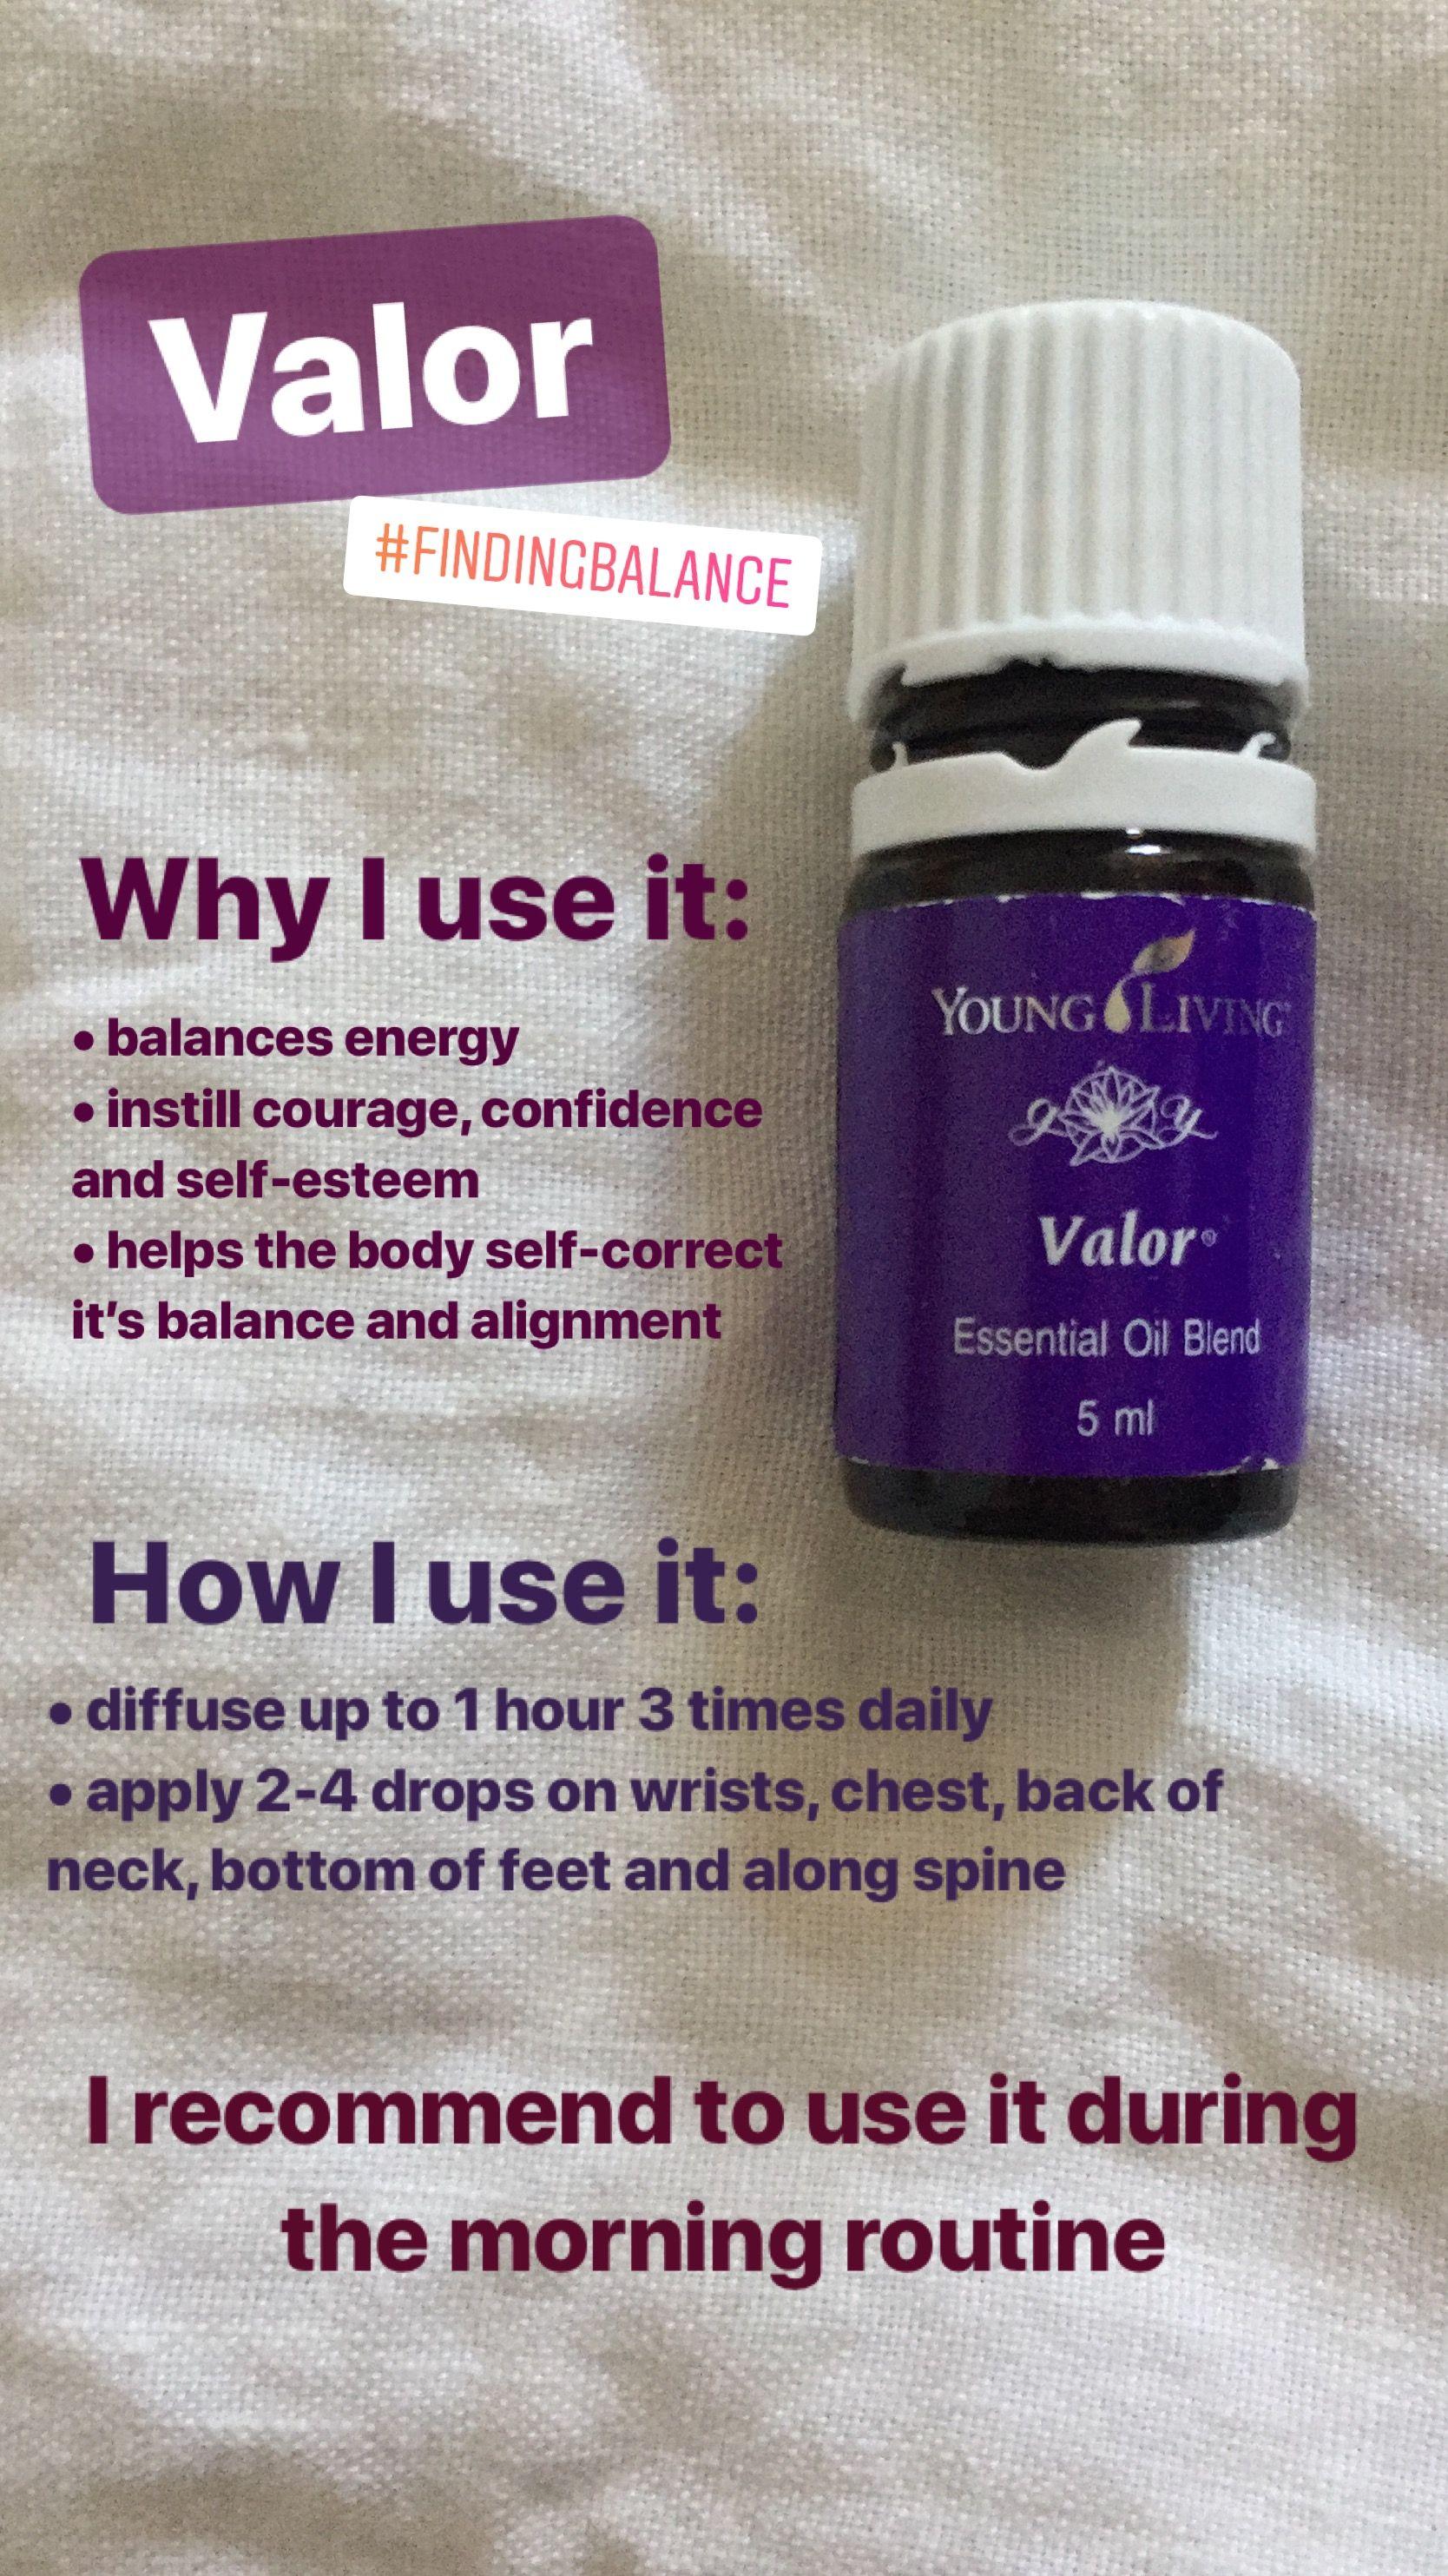 How To Use Valor Essential Oil Essentialoils Eo Yleo Relax Meditation Health Organic Ve Essential Oils For Psoriasis Valor Essential Oil Essential Oils